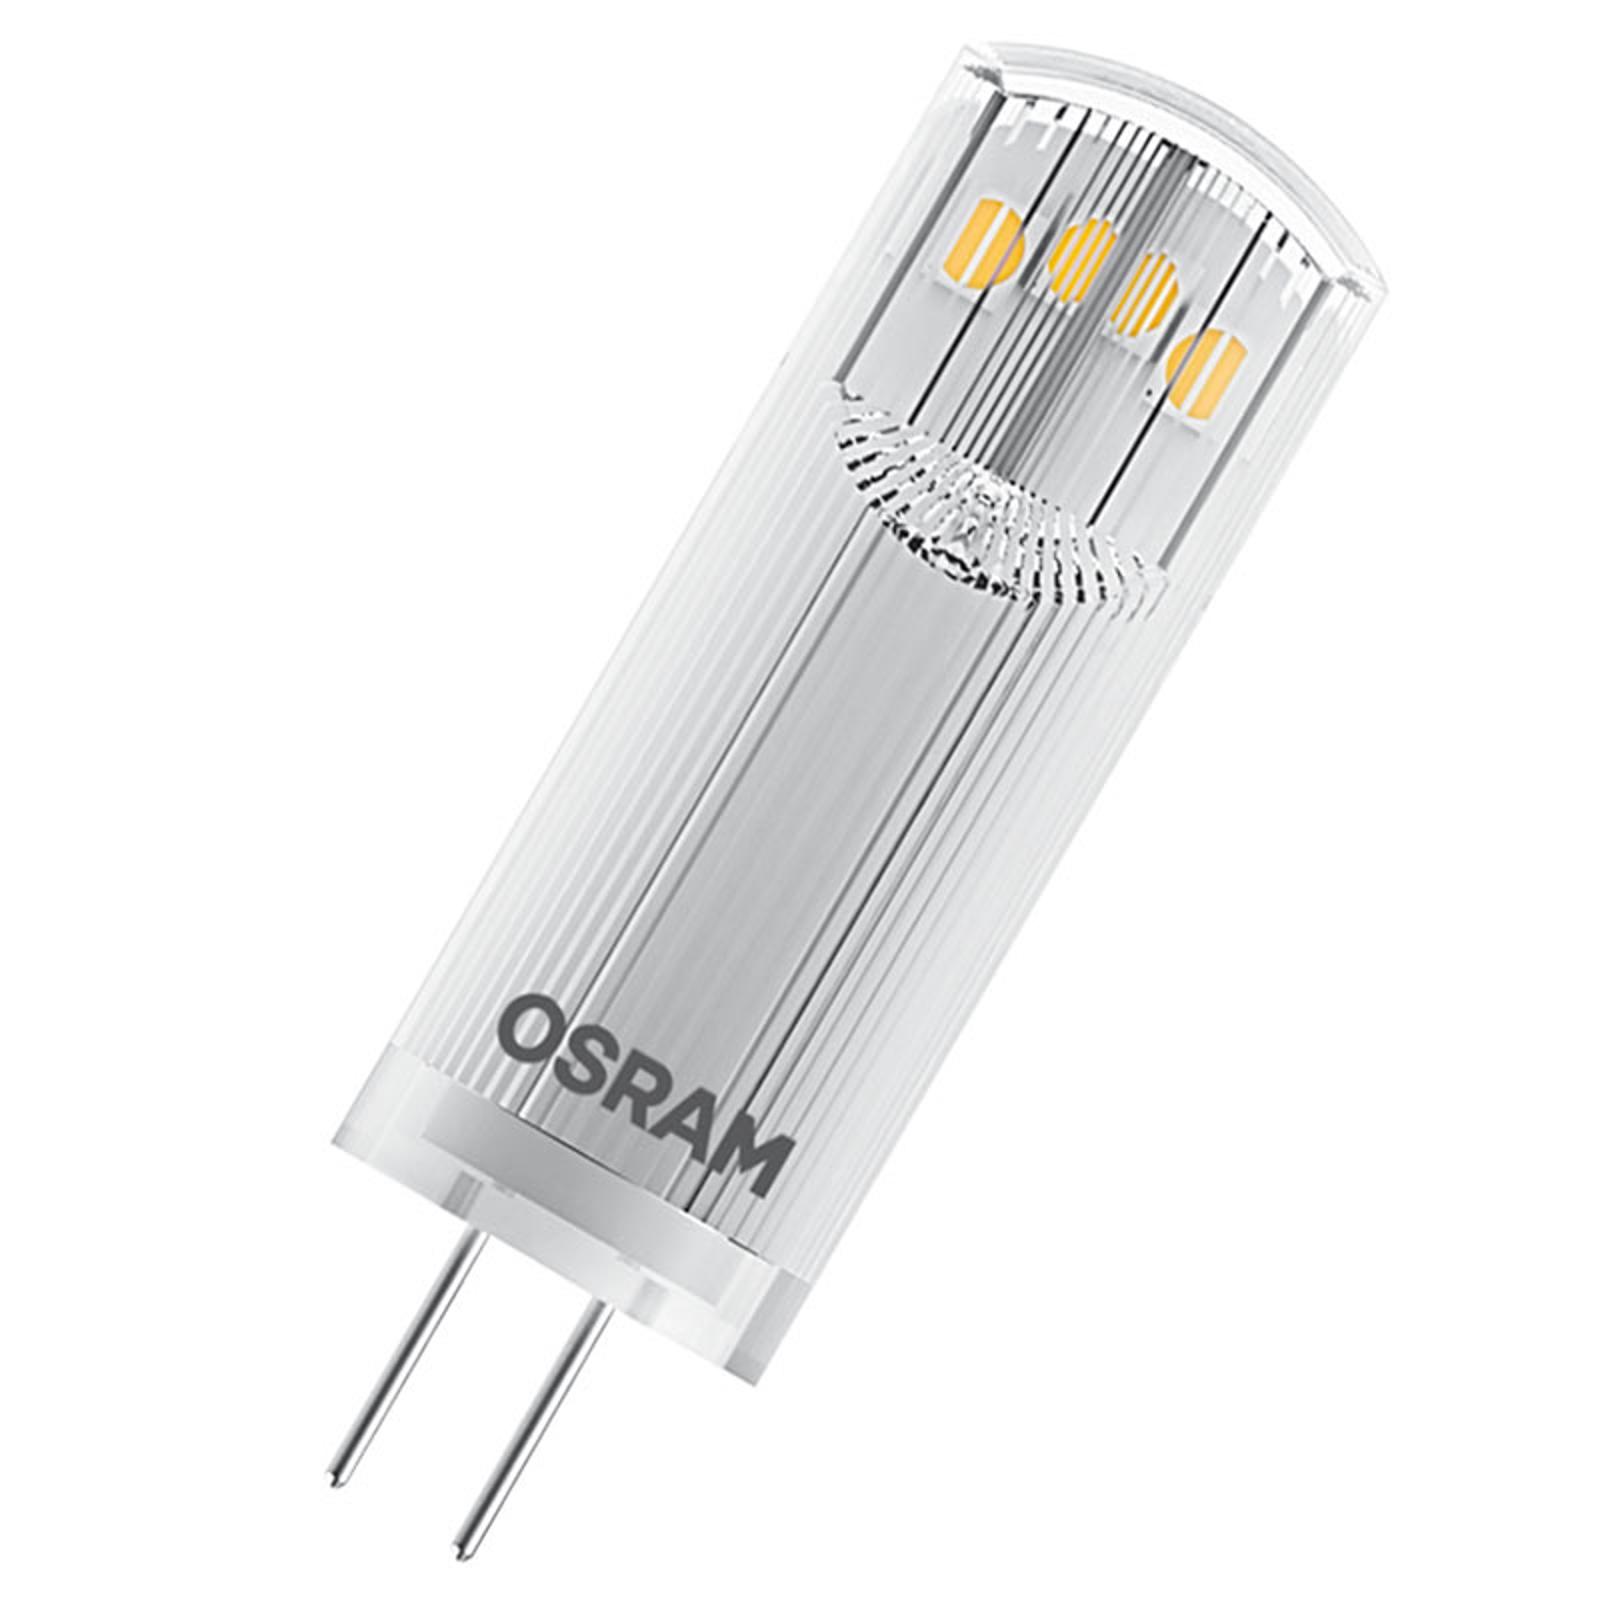 OSRAM żarówka LED G4 Star Pin 1,8W matowa 4000K